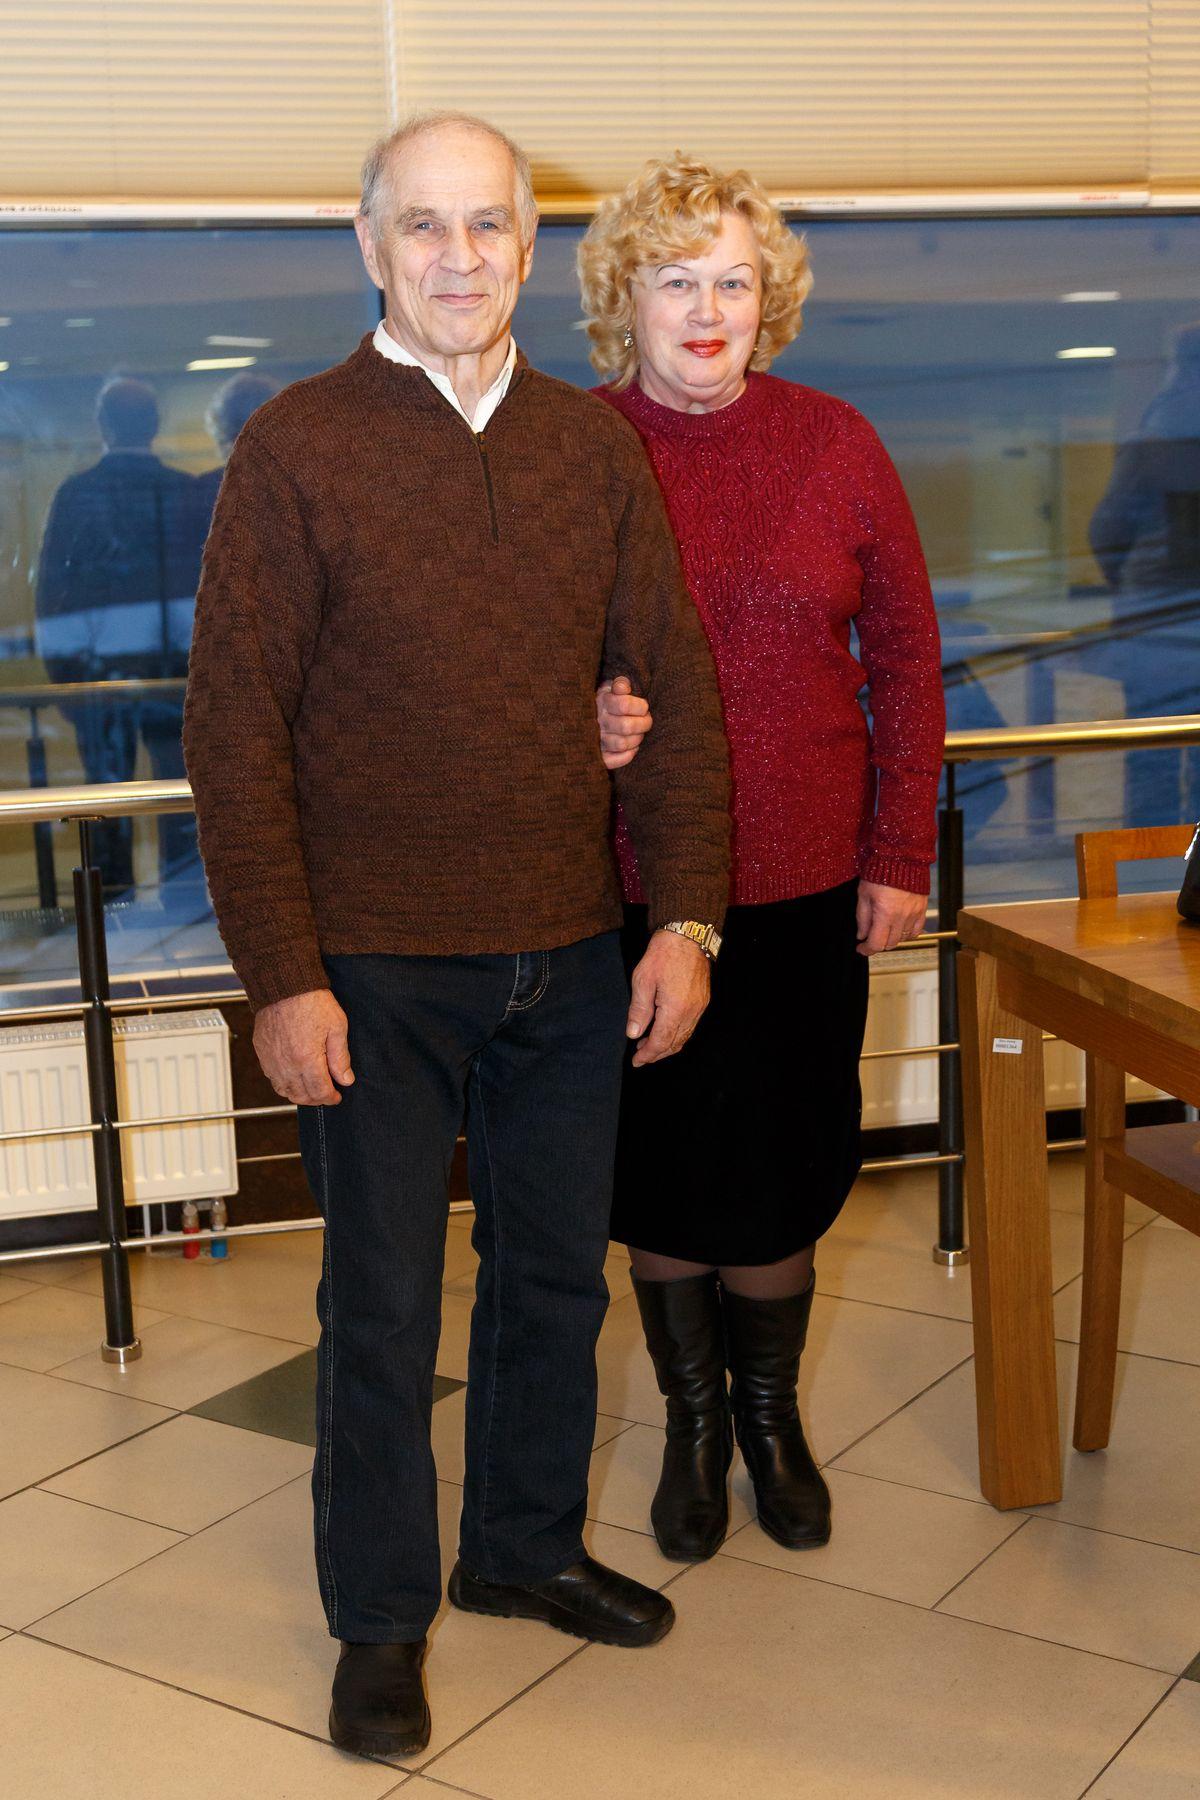 Супруги Людмила и Иван. Фото: Александр КОРОБ